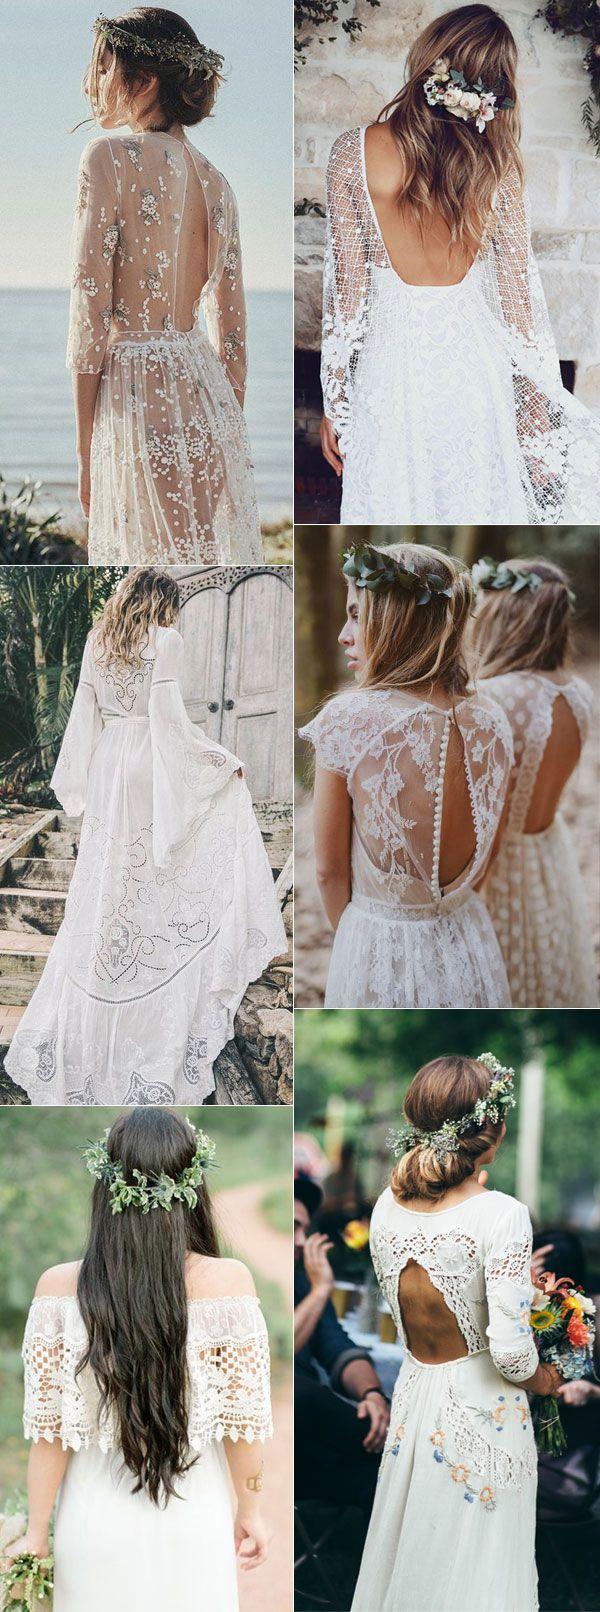 Romantic Boho Bridal Dress Inspiration